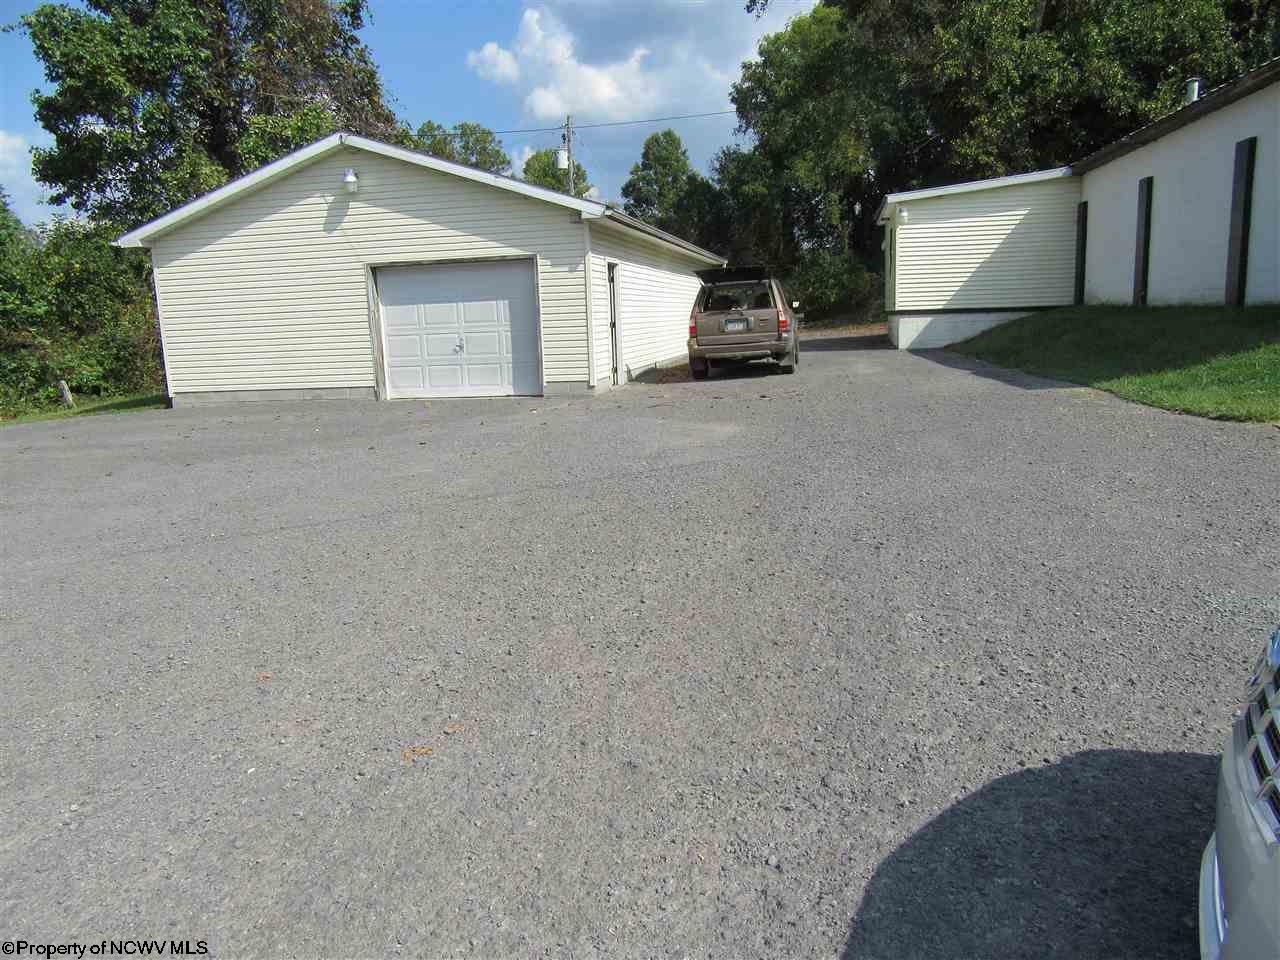 486 HAMPTON ROAD, FAIRMONT, WV 26554  Photo 3